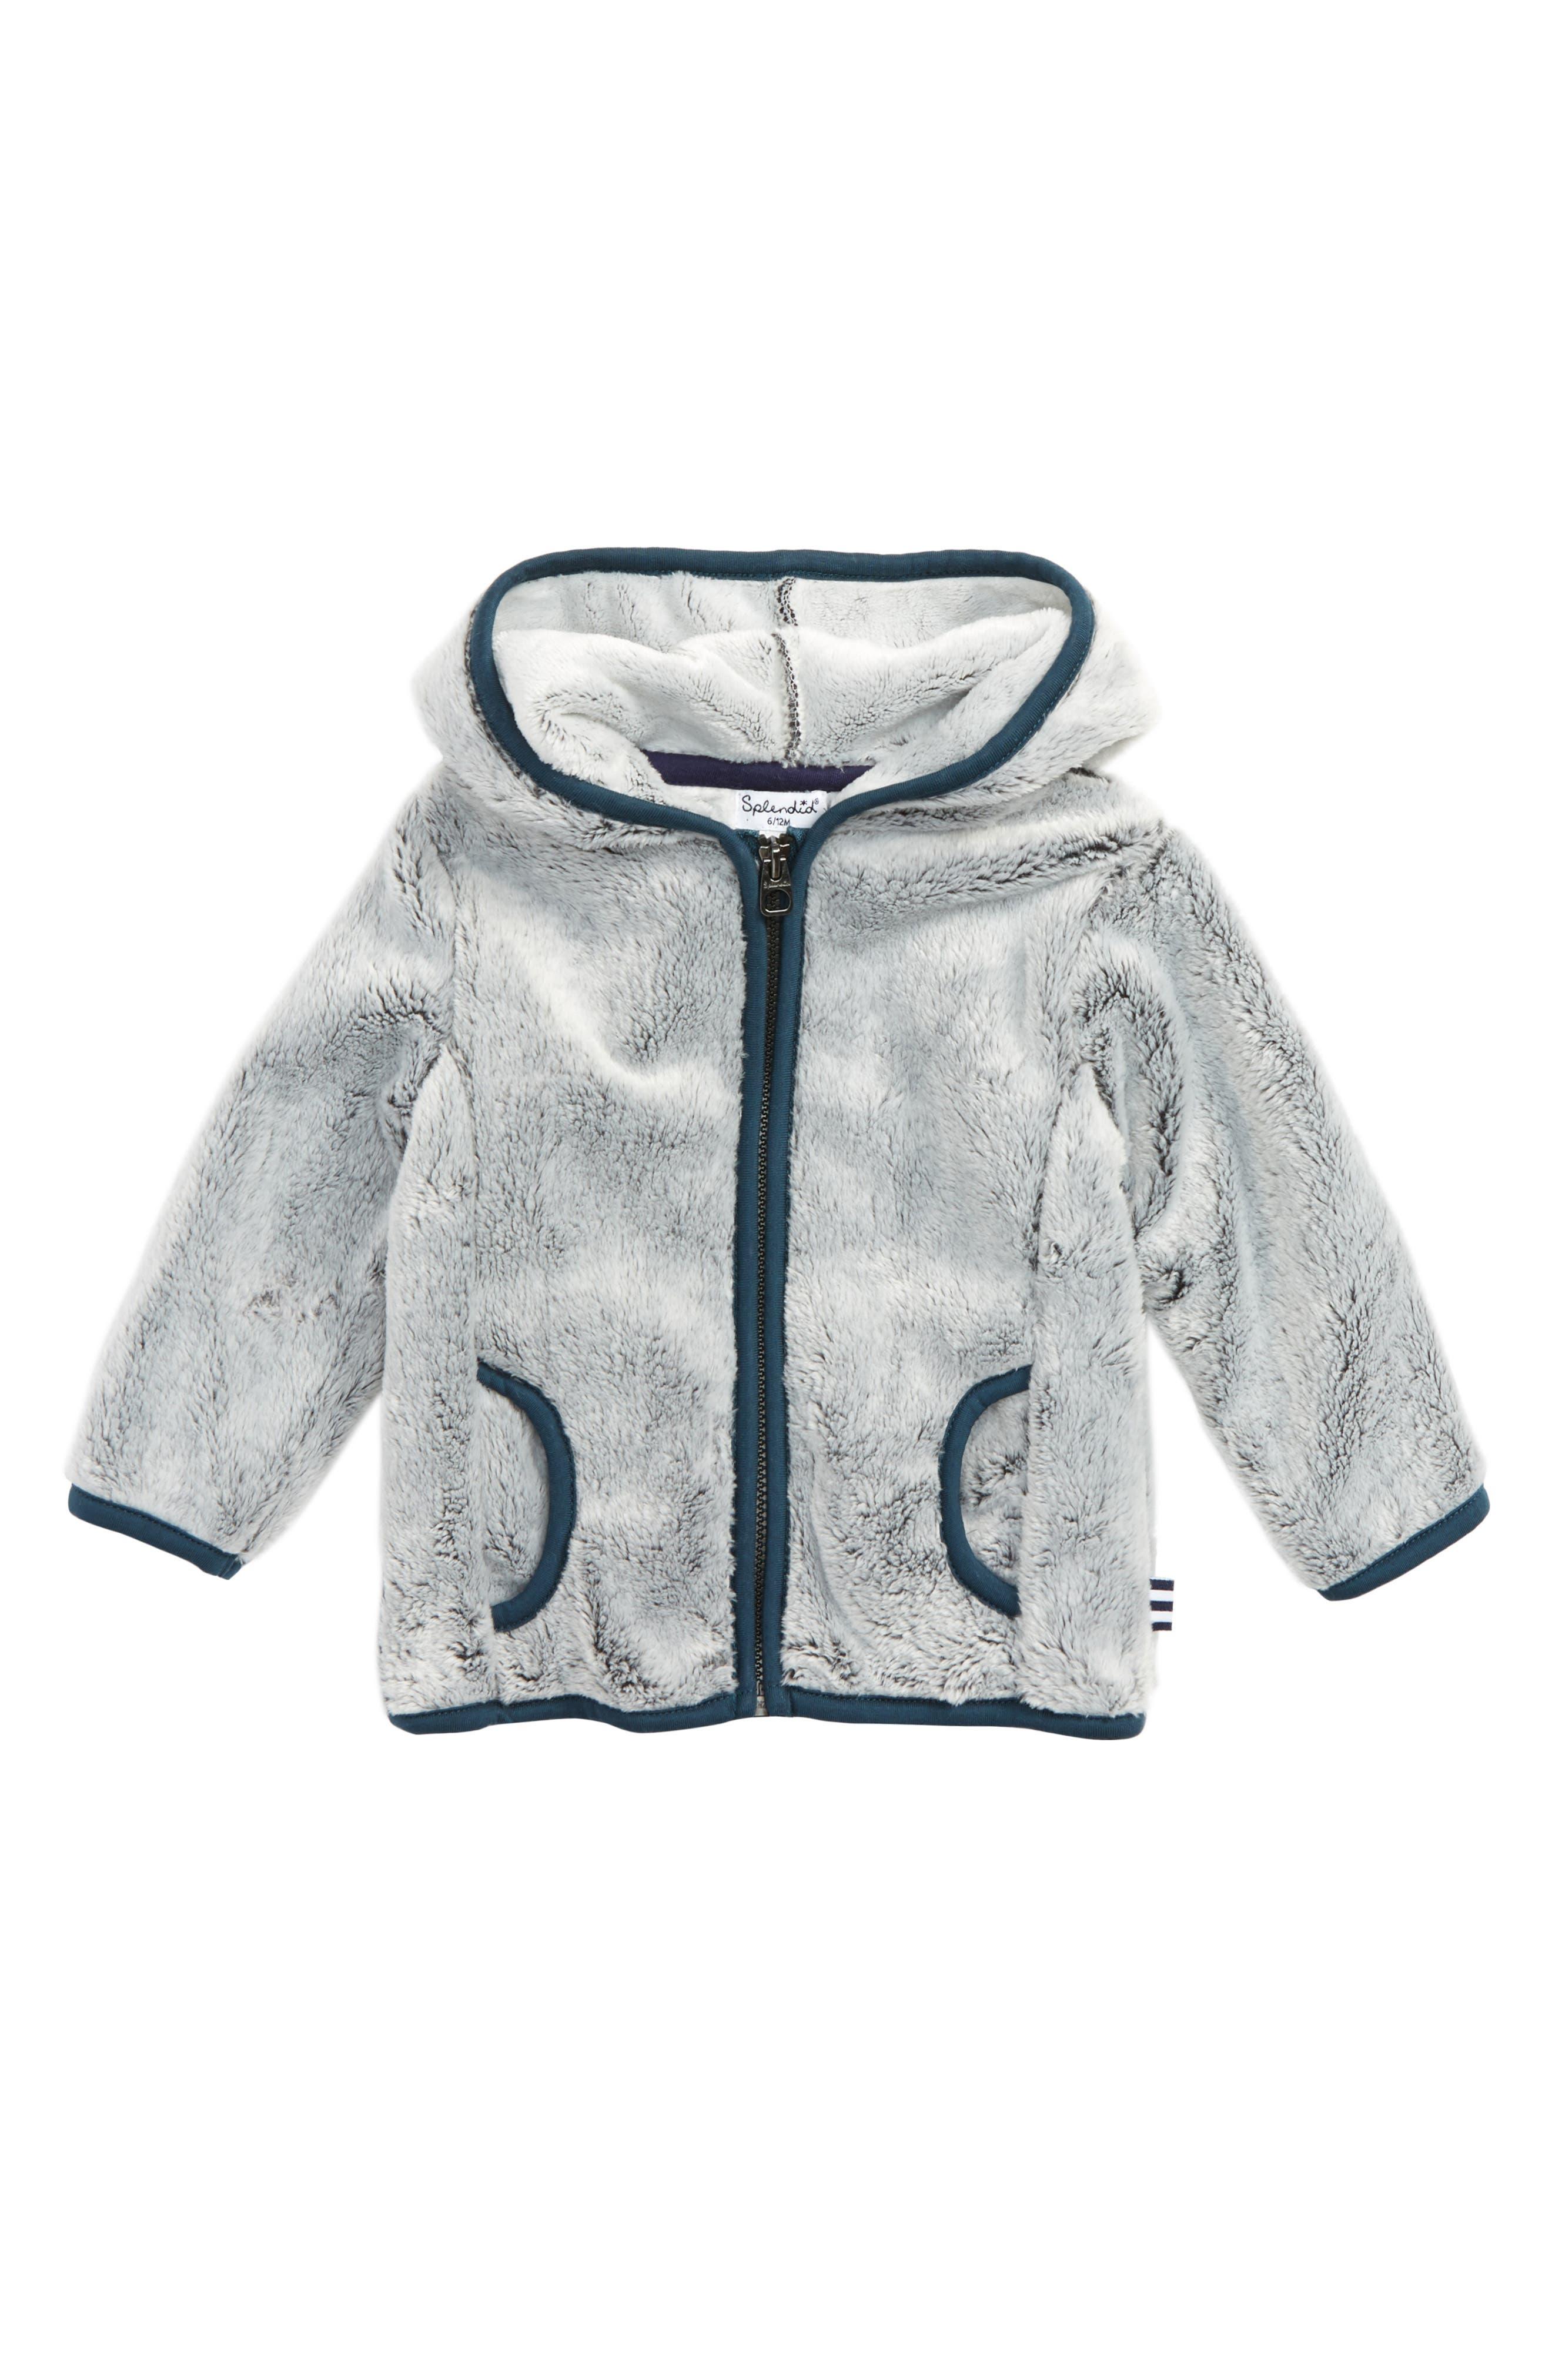 Hooded Fleece Jacket,                             Main thumbnail 1, color,                             Grey Heather